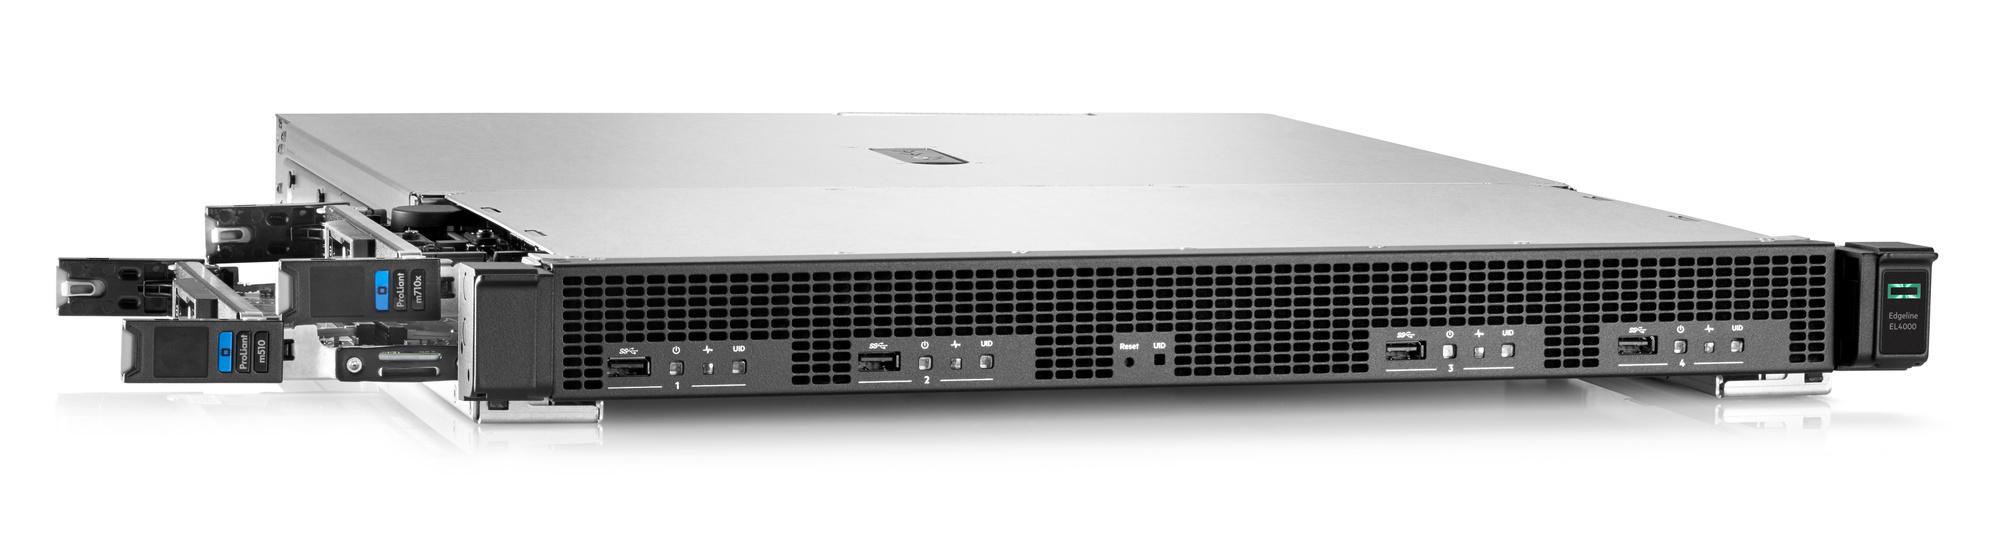 HPE Edgeline EL4000 System, HPE